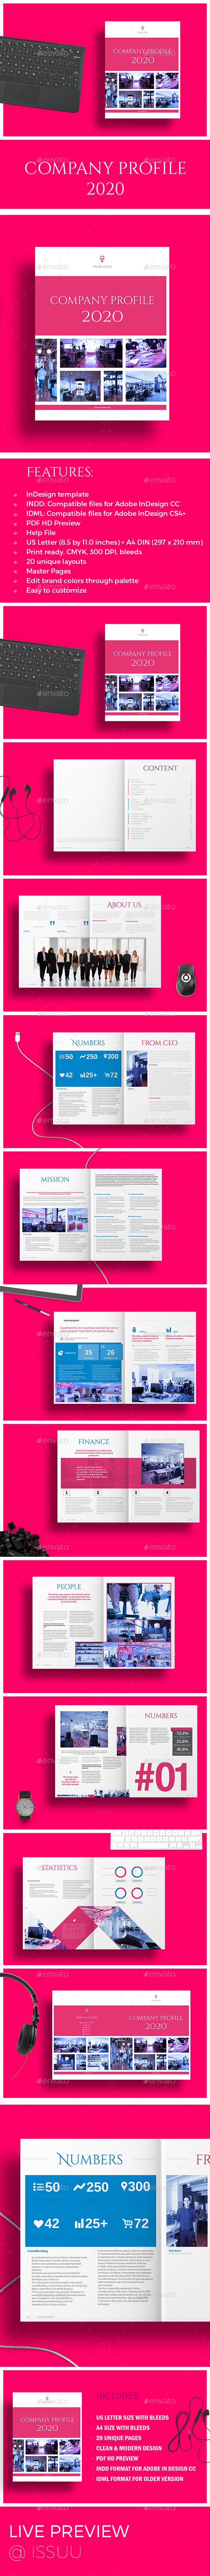 Company Profile 2020 - Corporate Brochures